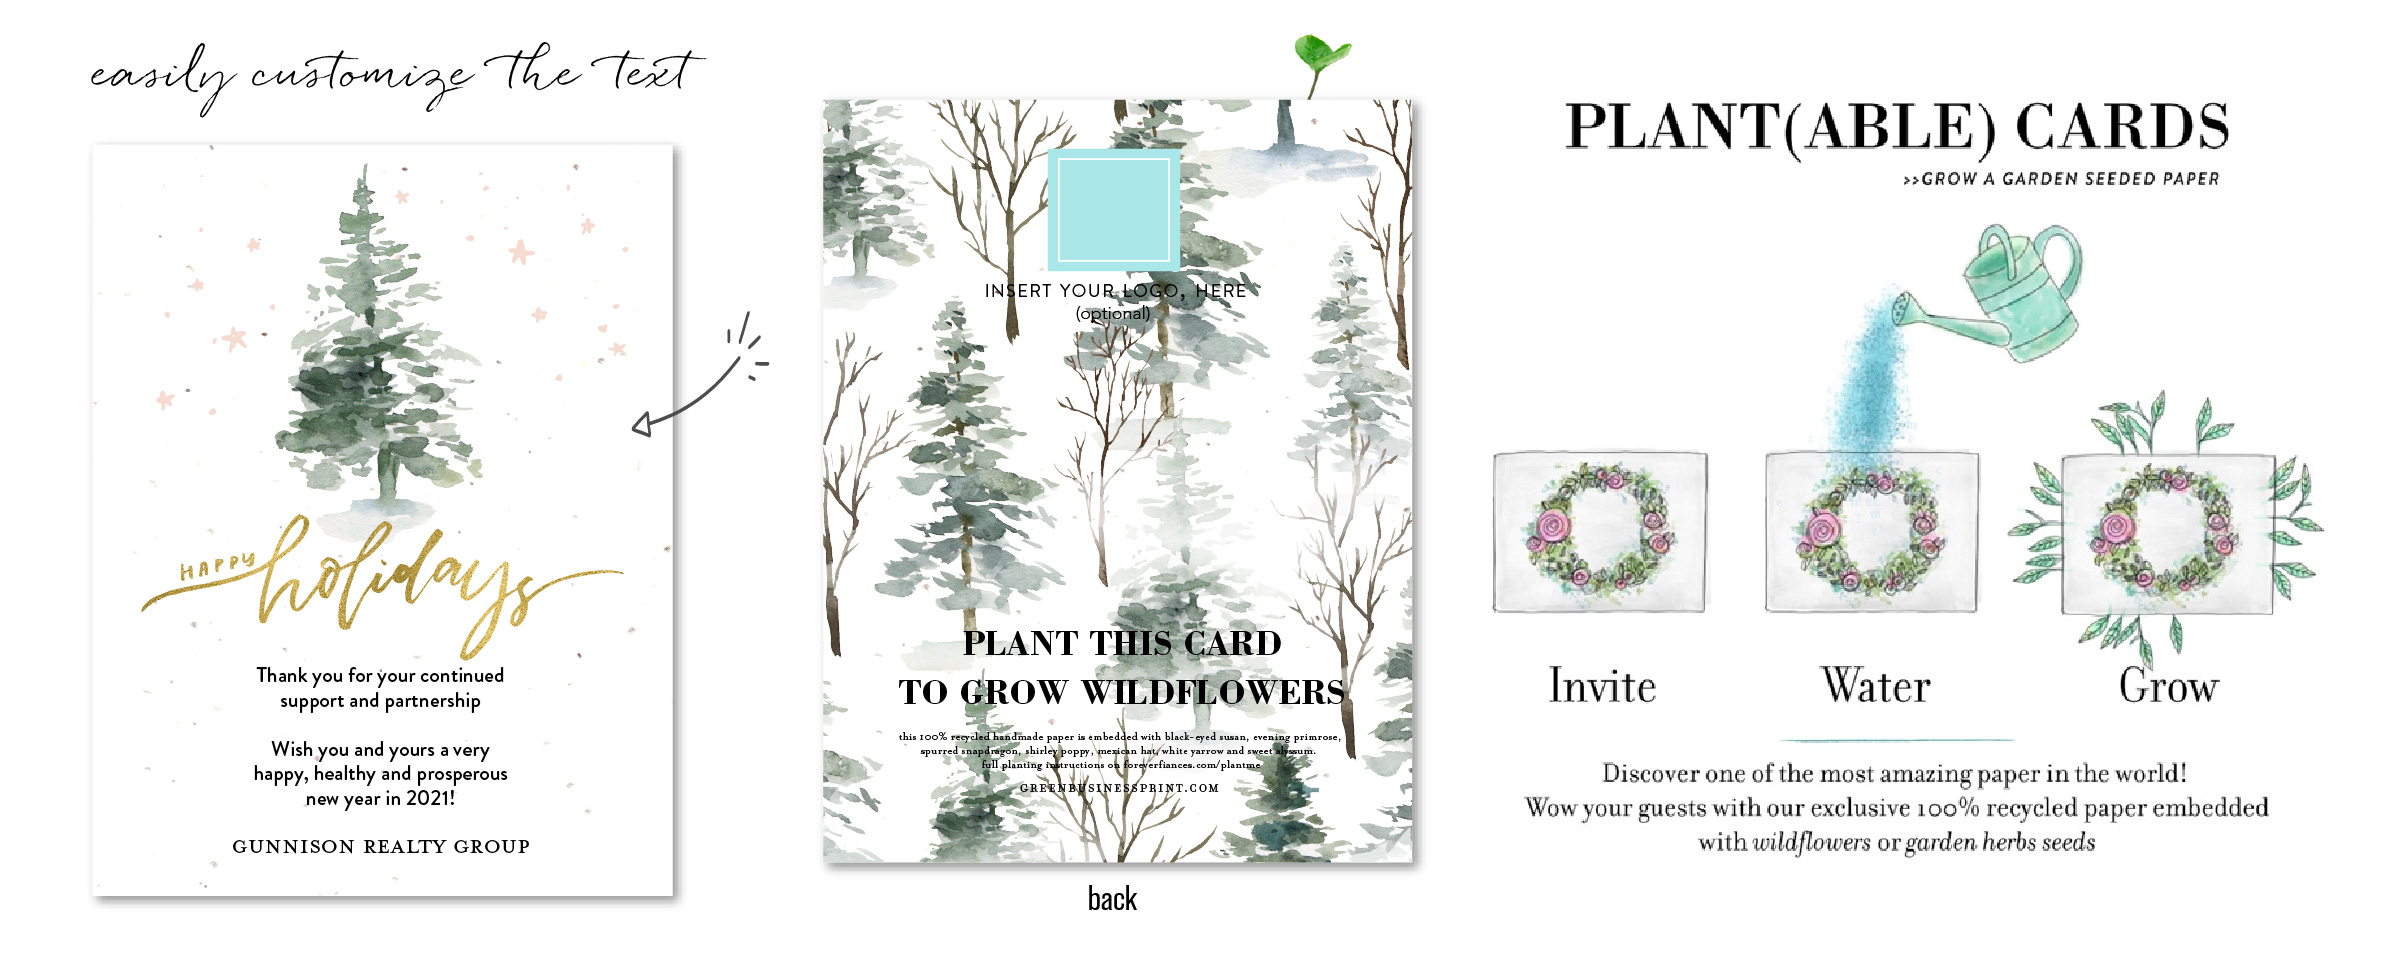 Bright & Merry Tree cards